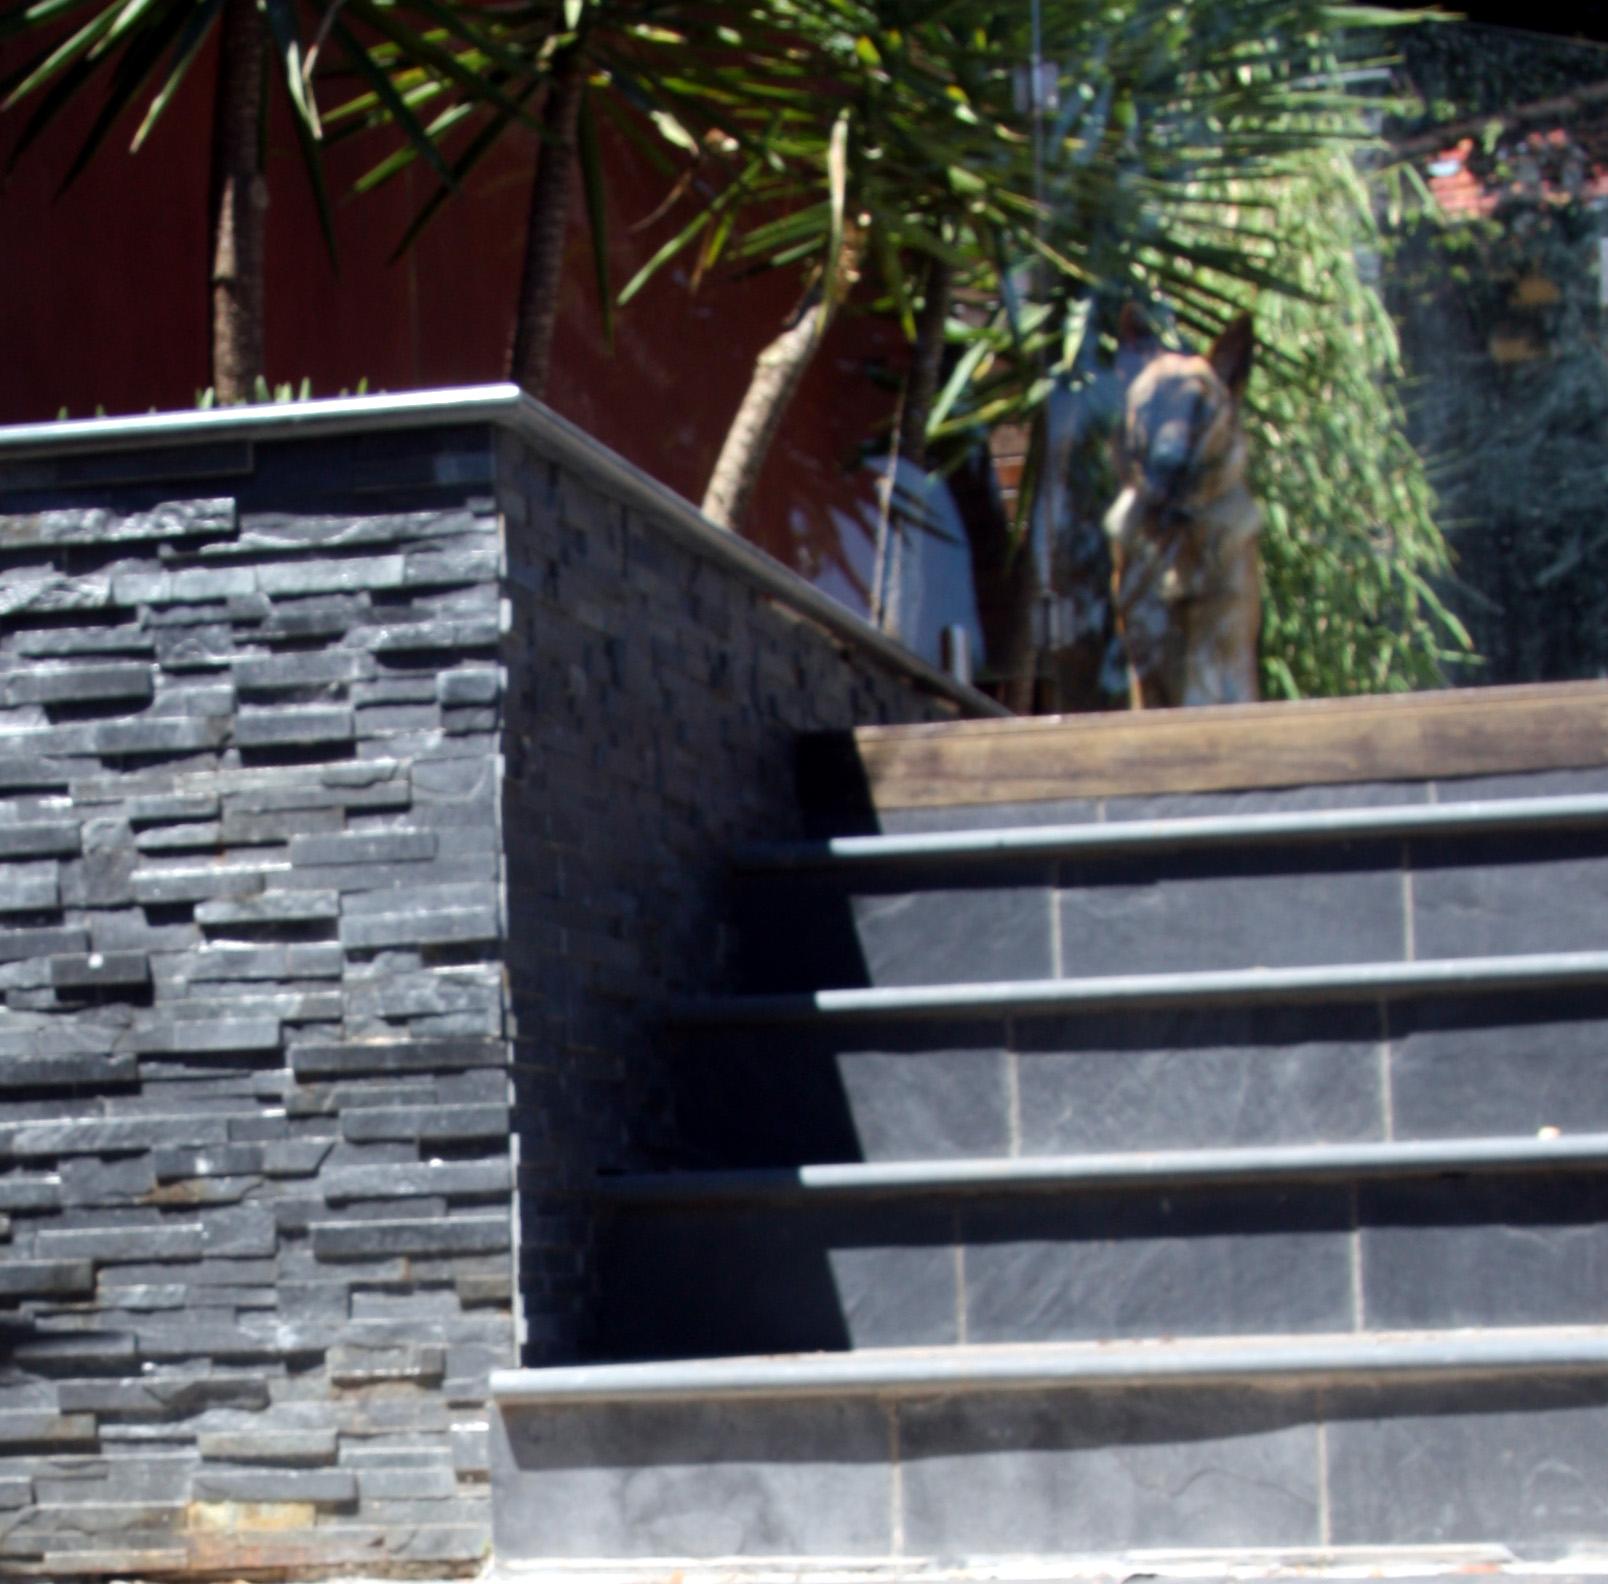 Silverblue & Chinablk stairs.jpg